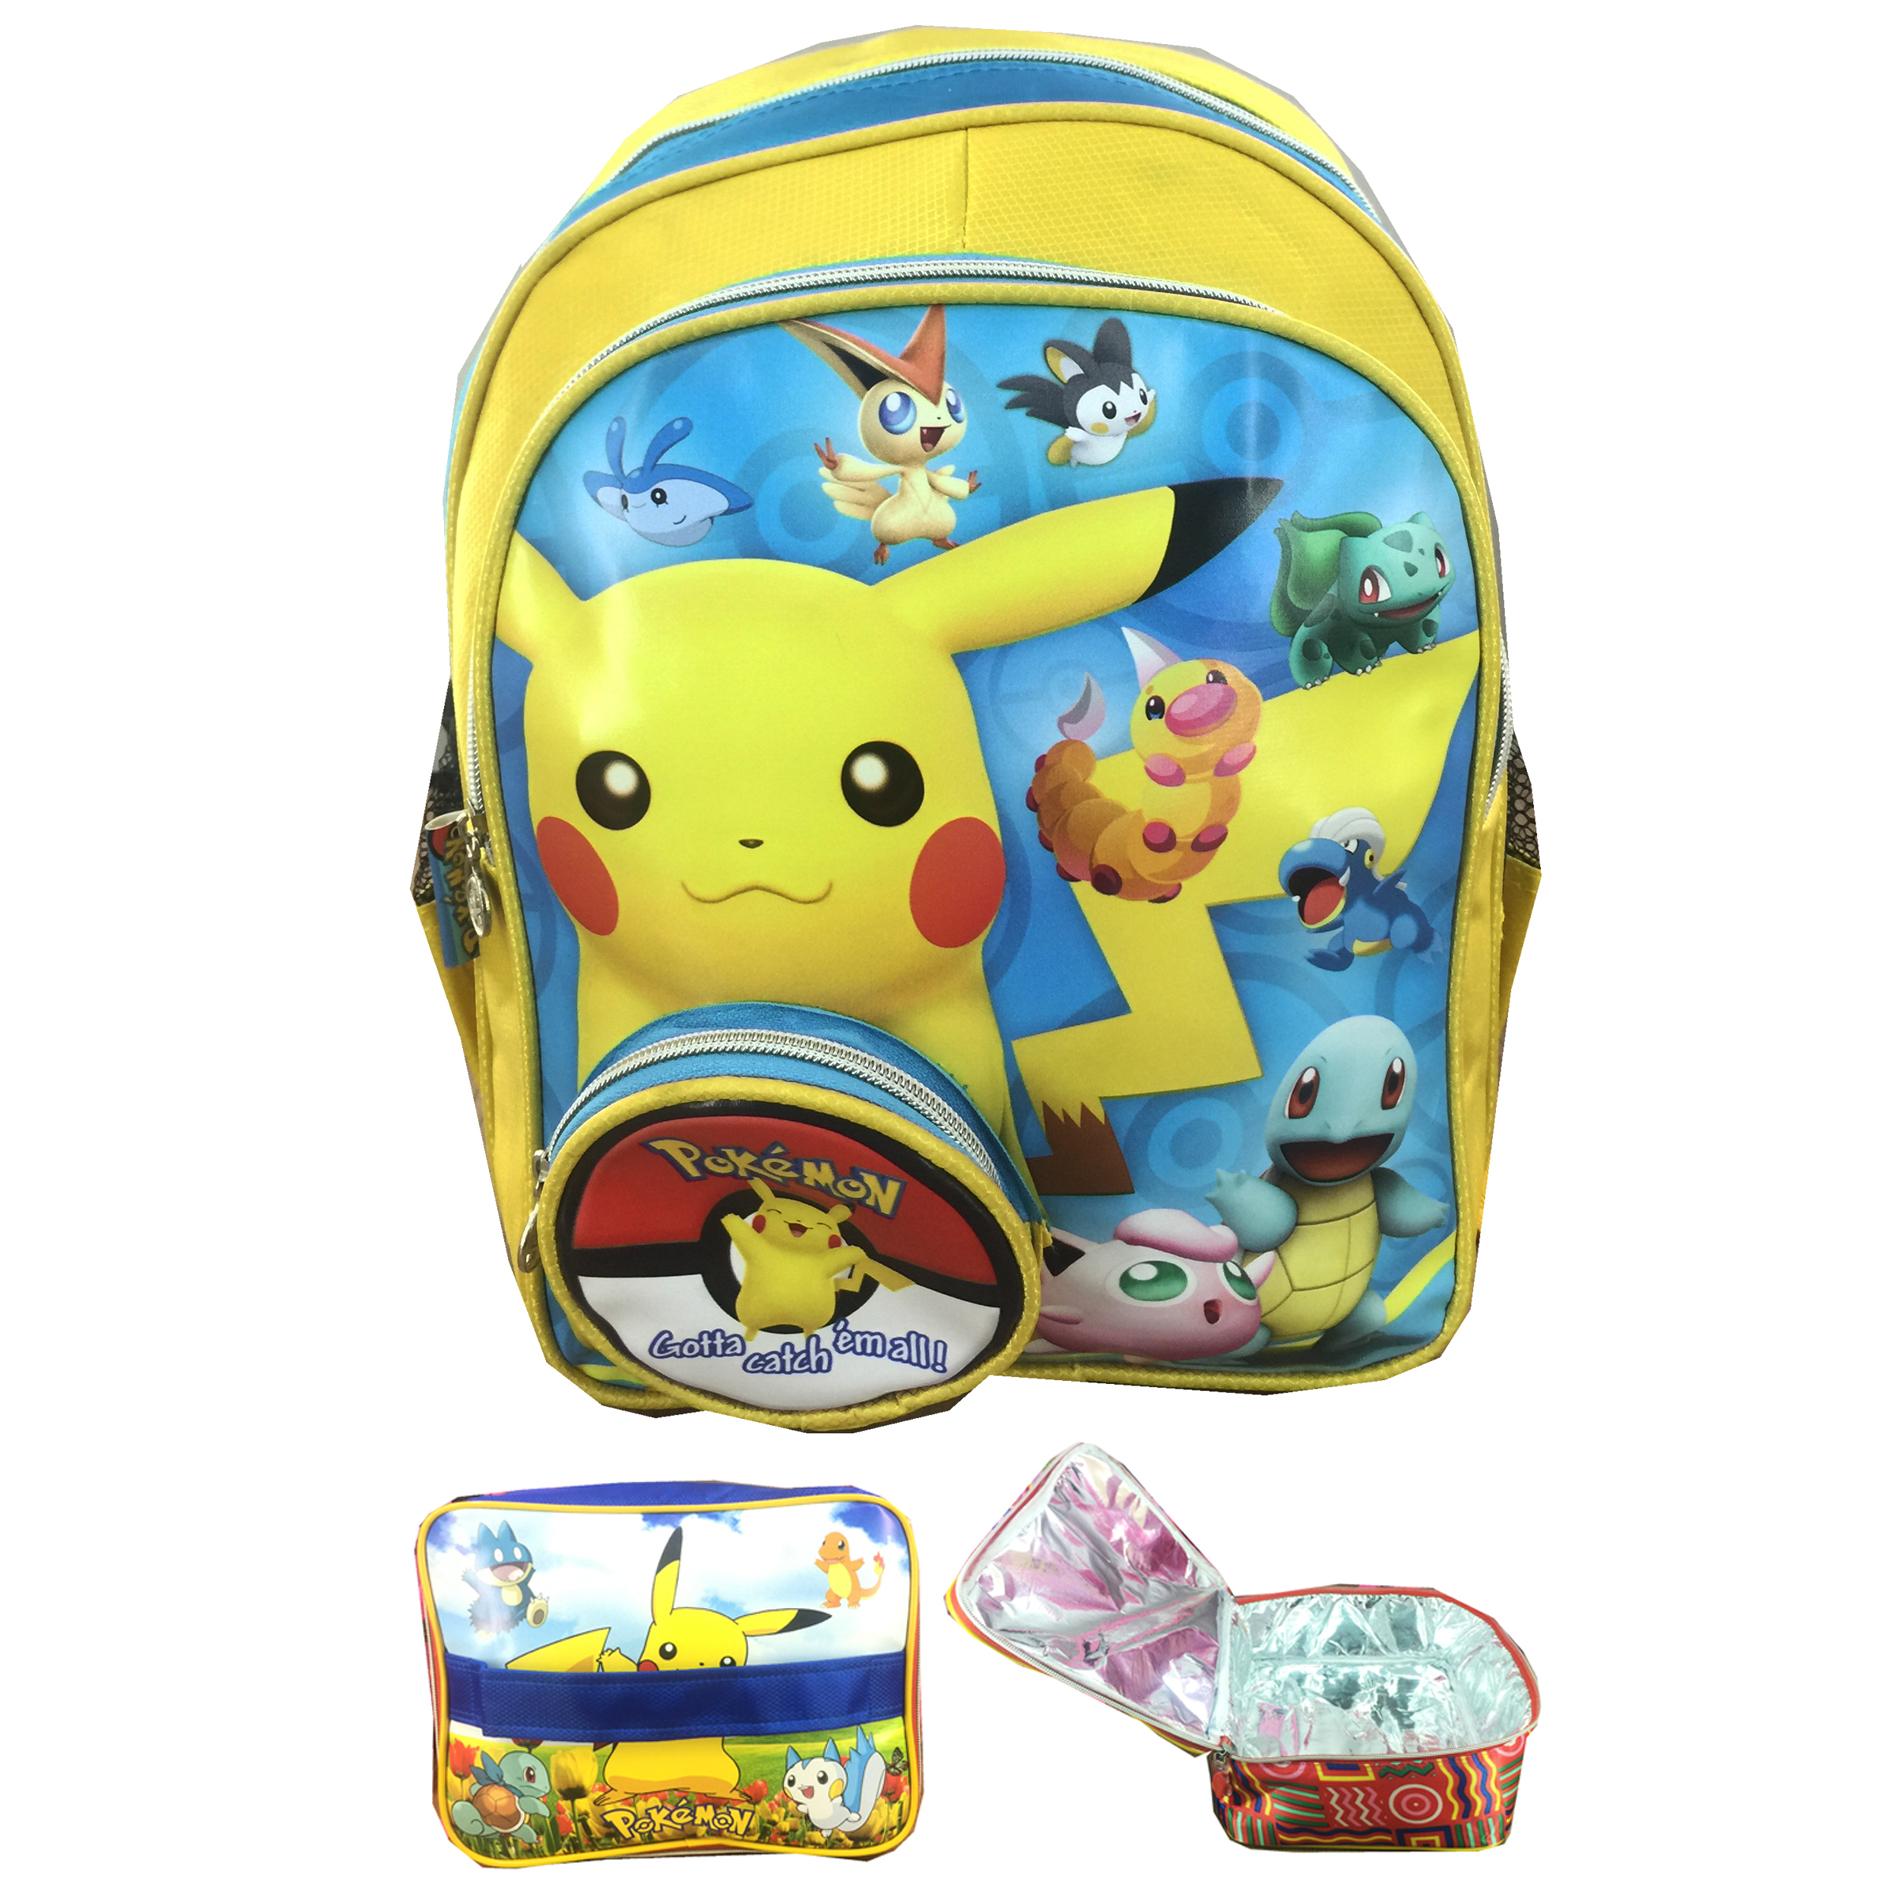 Jual Tas Ransel Sekolah Anak TK Pokemon Go Pikachu Koin Timbul LB - Grace Store Jakarta   Tokopedia